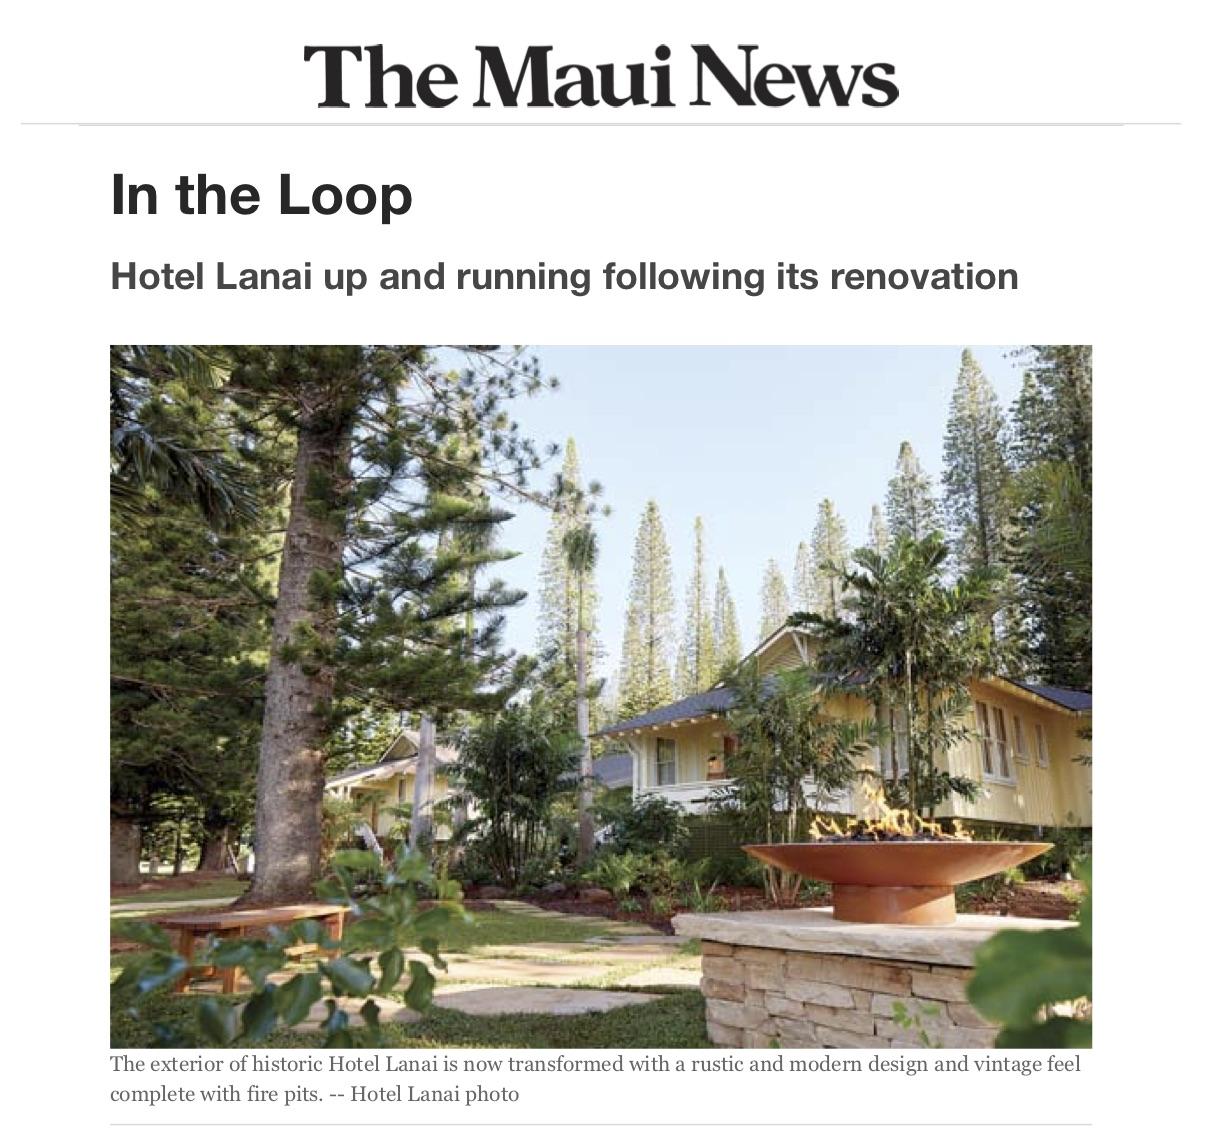 The Maui News - Hotel Lanai.jpg